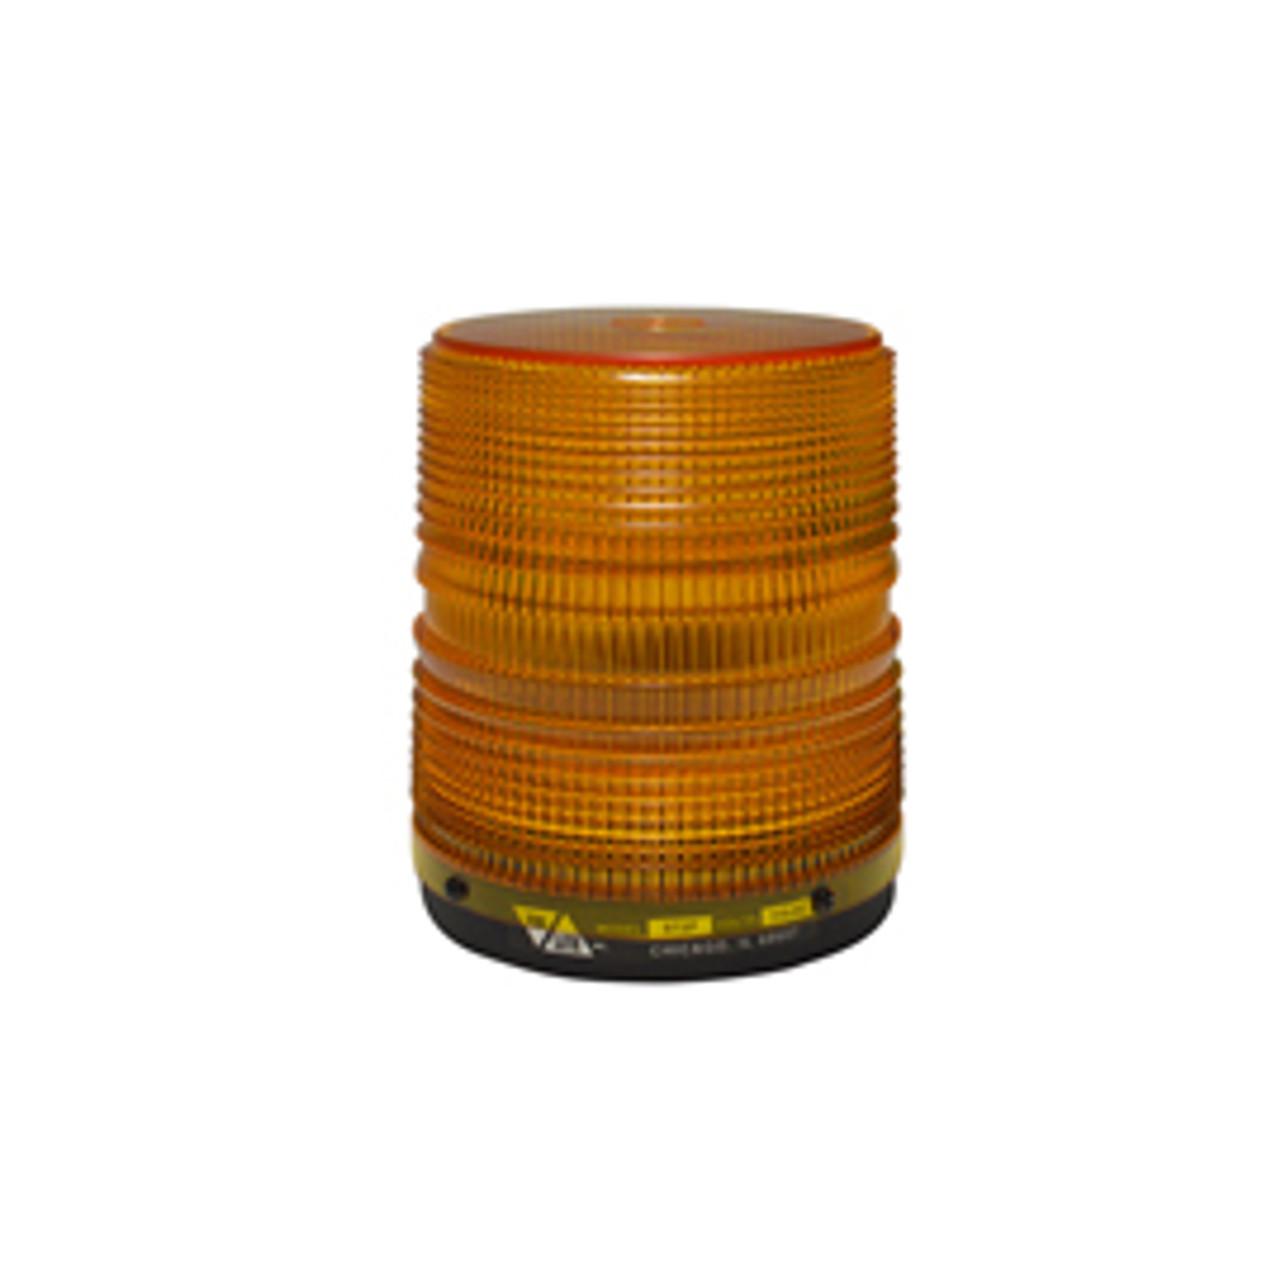 TriLite ST2-110SP-A AC Strobe Warning Light